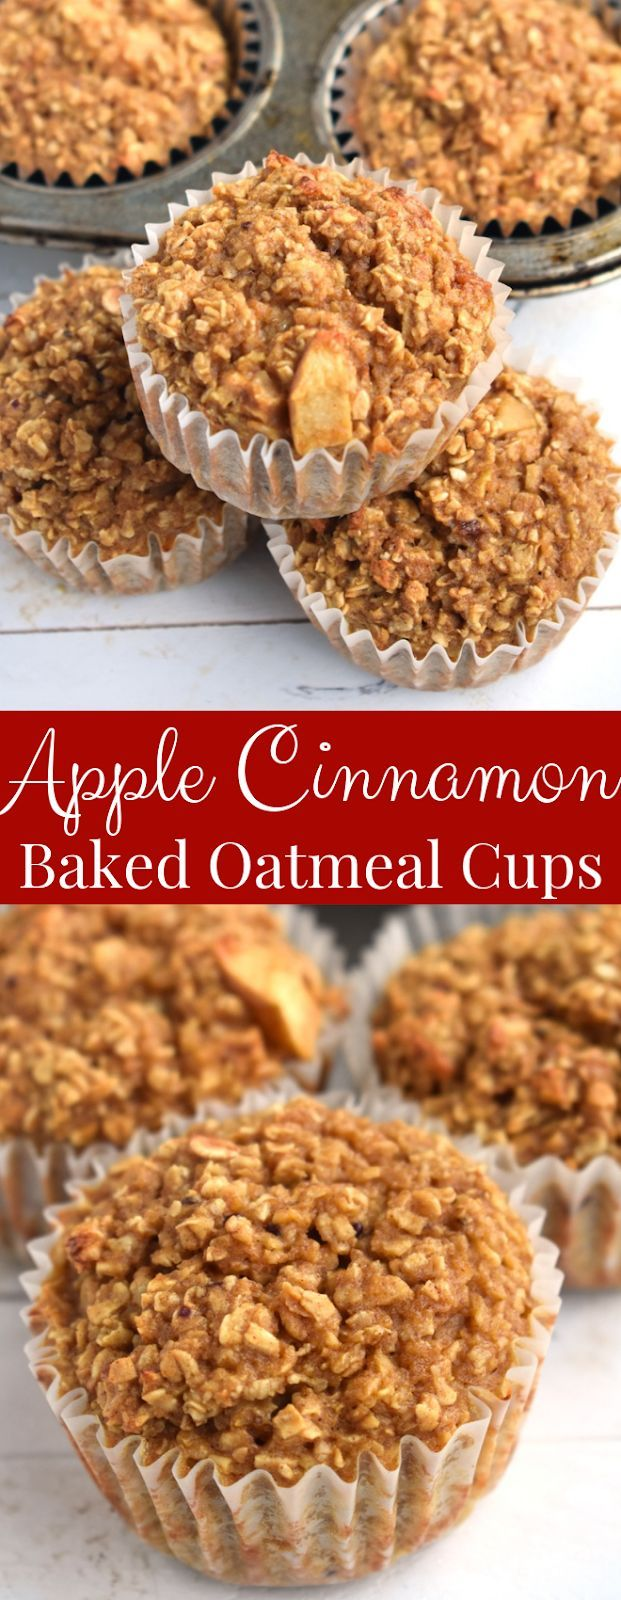 Apple Cinnamon Baked Oatmeal Cups #applerecipes